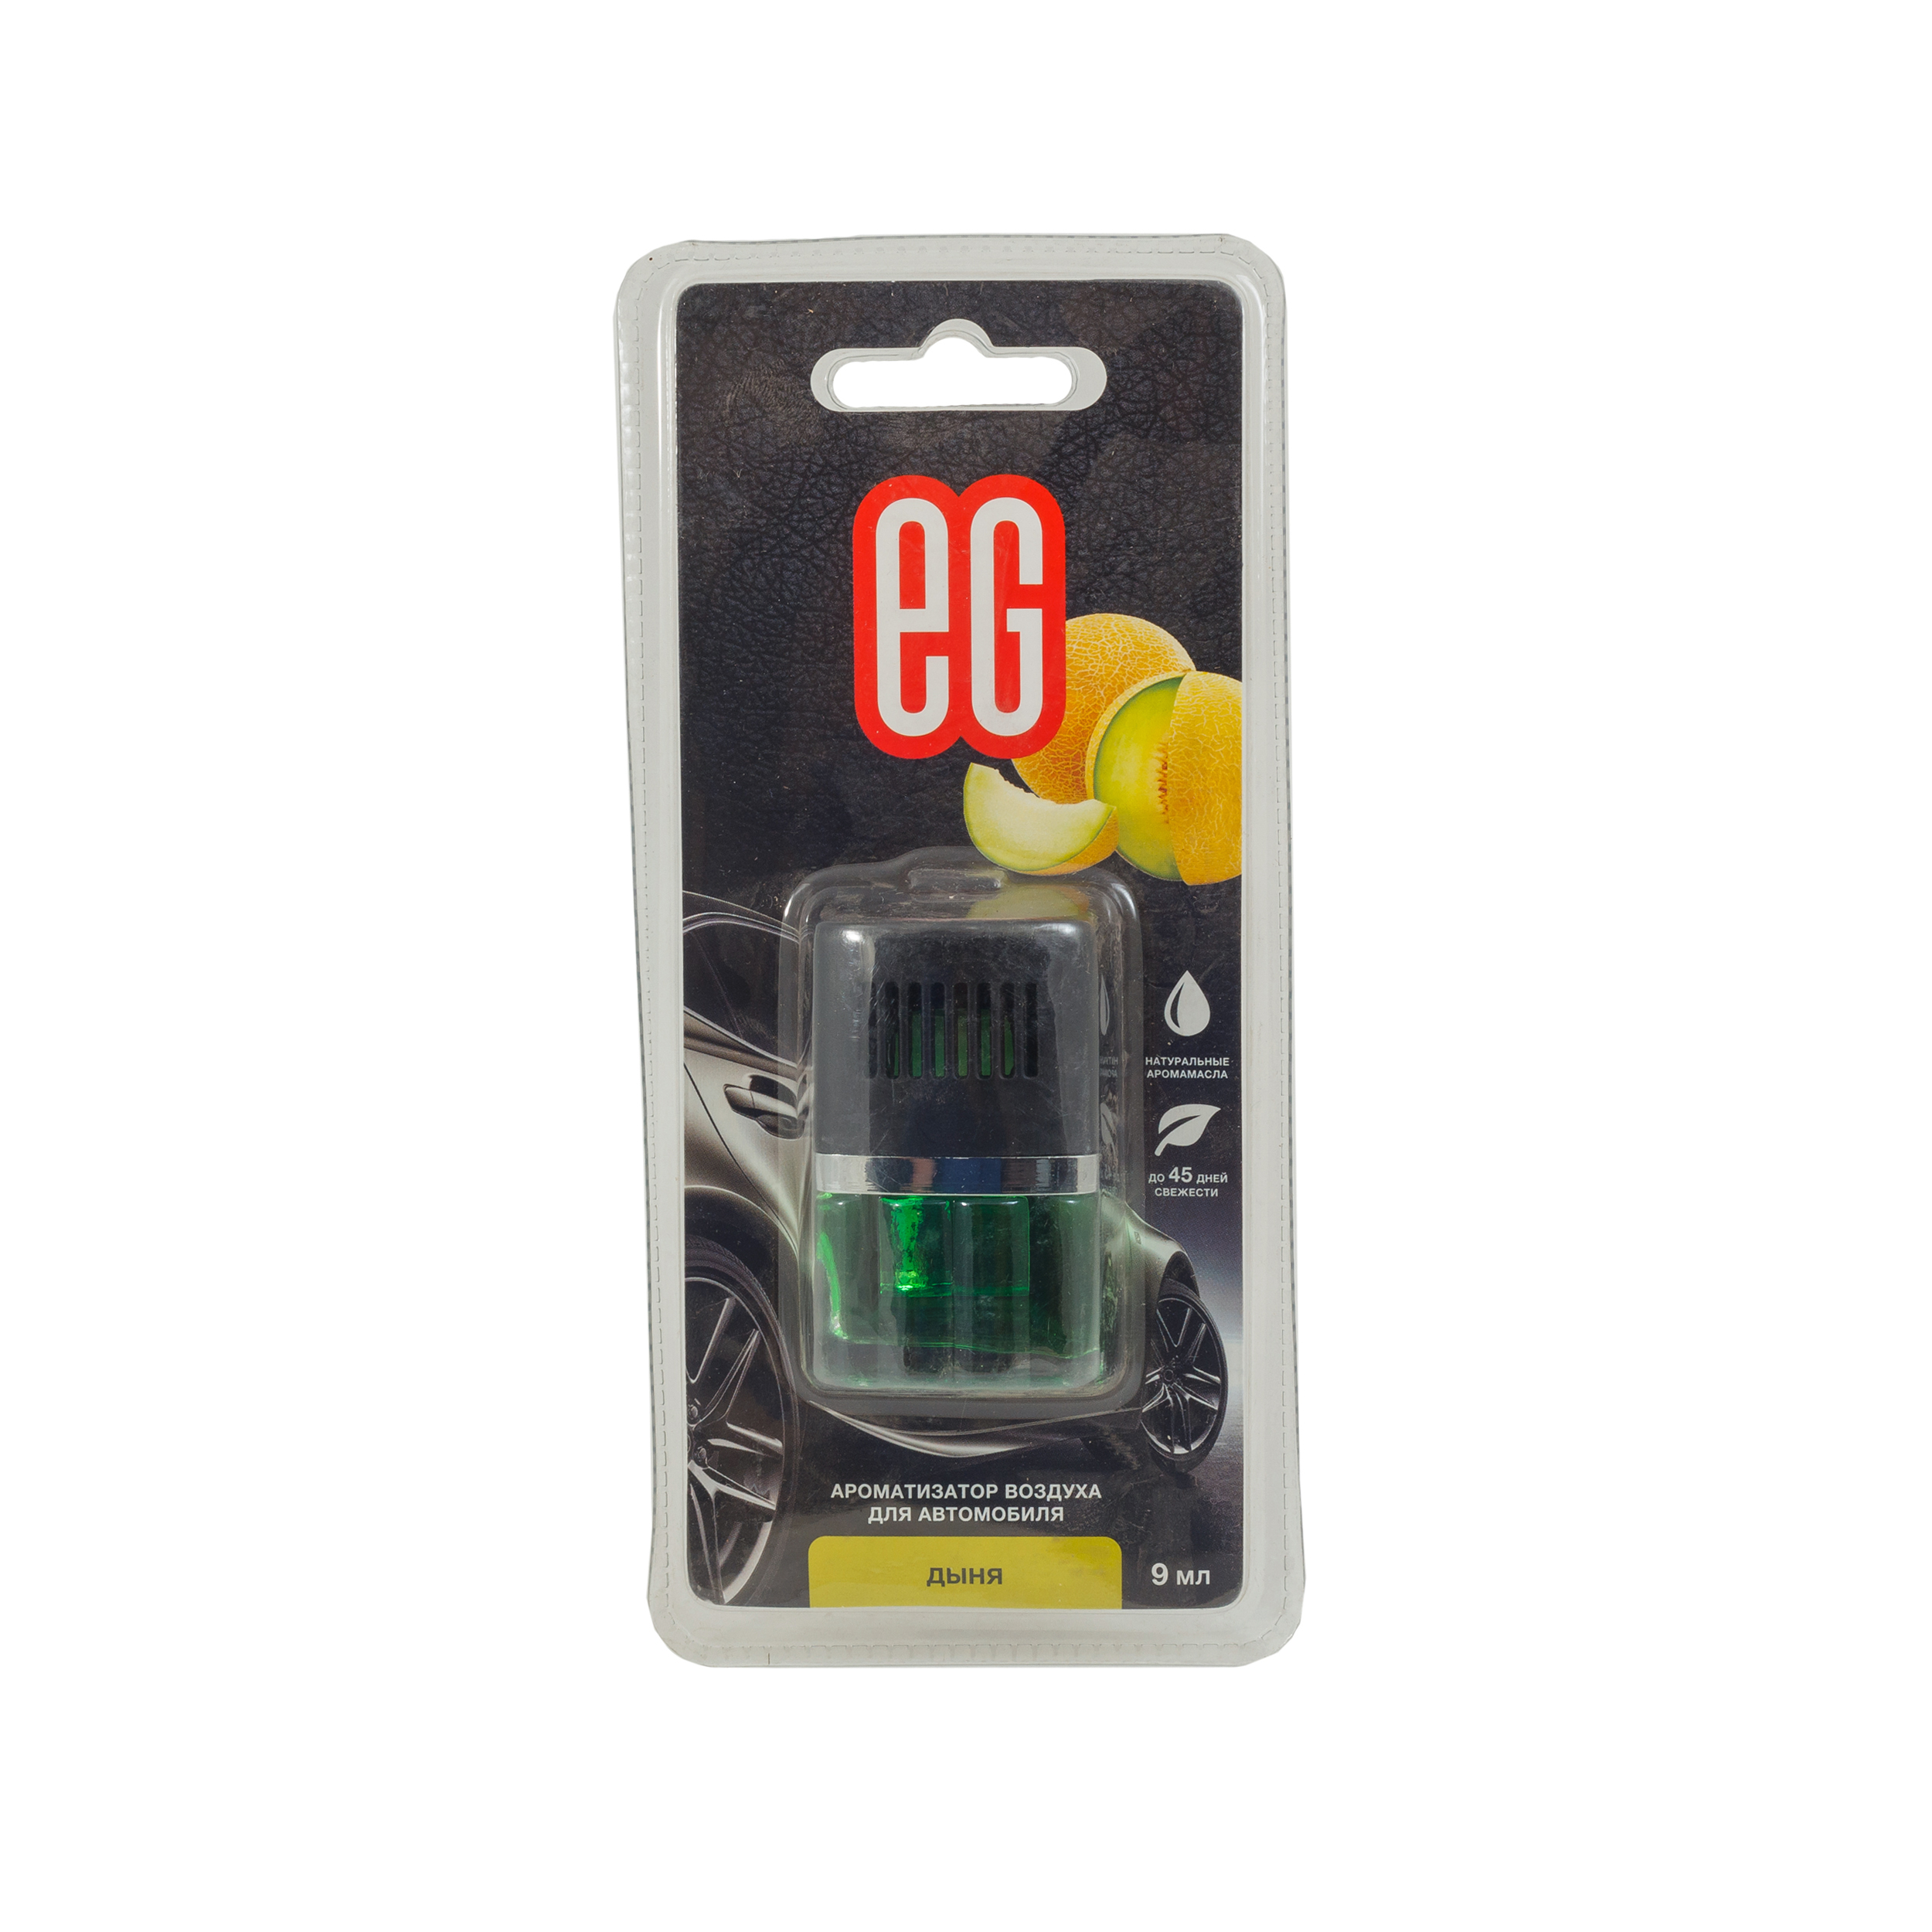 Ароматизатор на дефлектор 9мл дыня EG